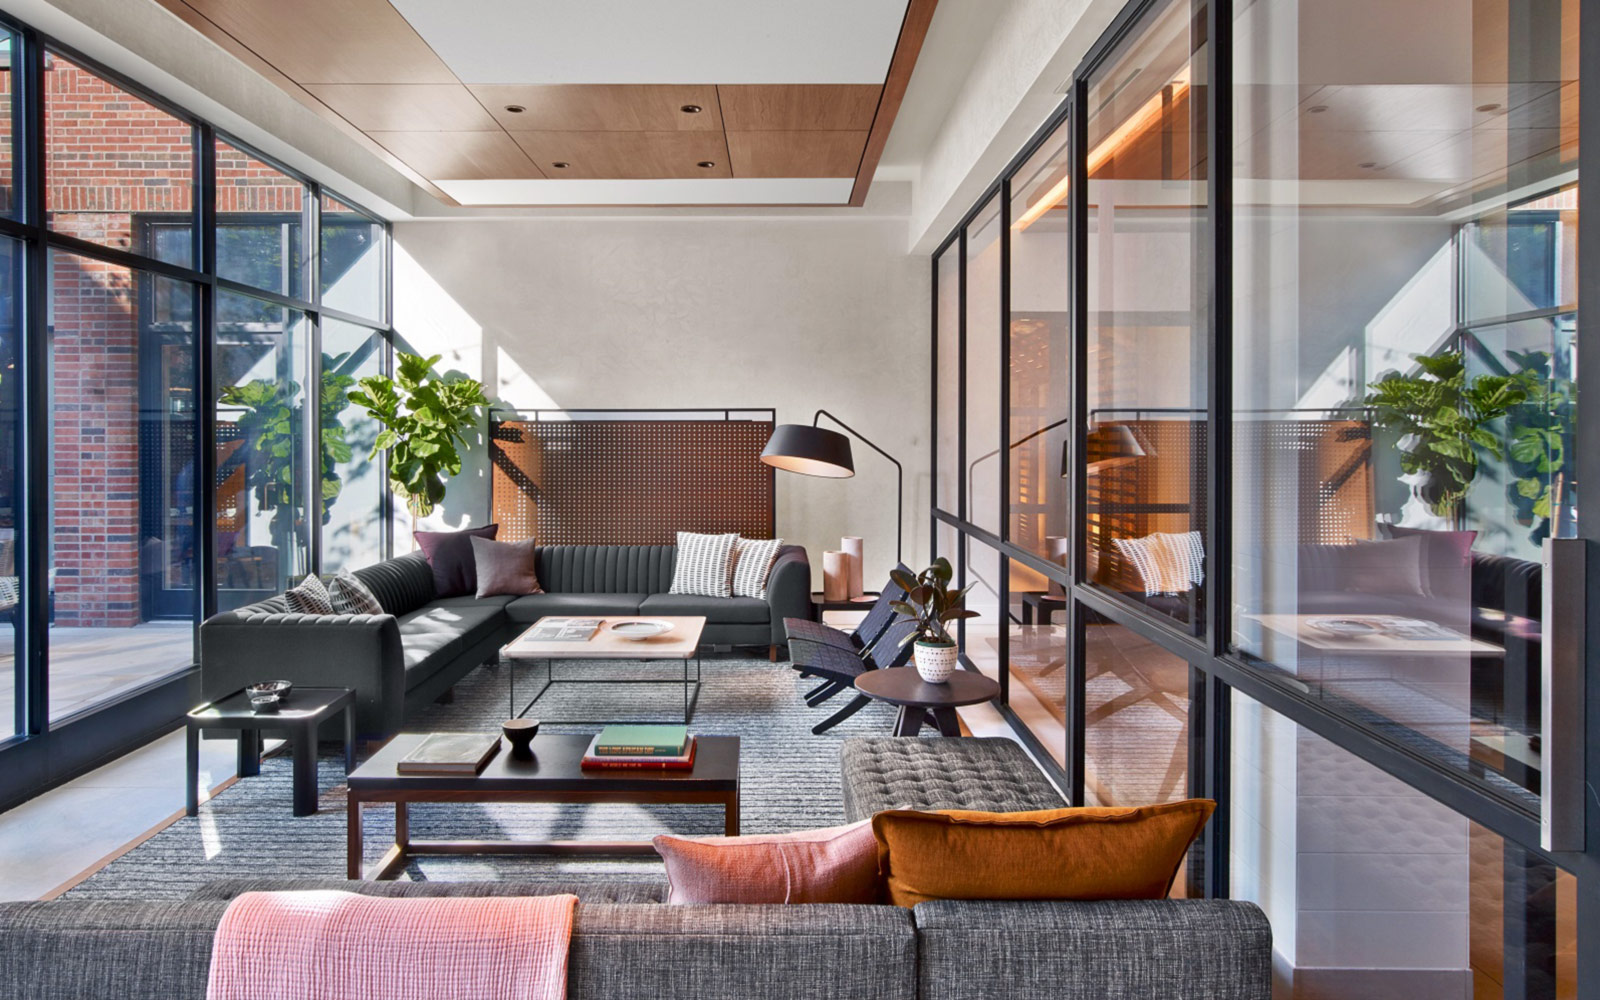 13-arlo-hudson-square-living-room-wide-view-1600x1000-1.jpg